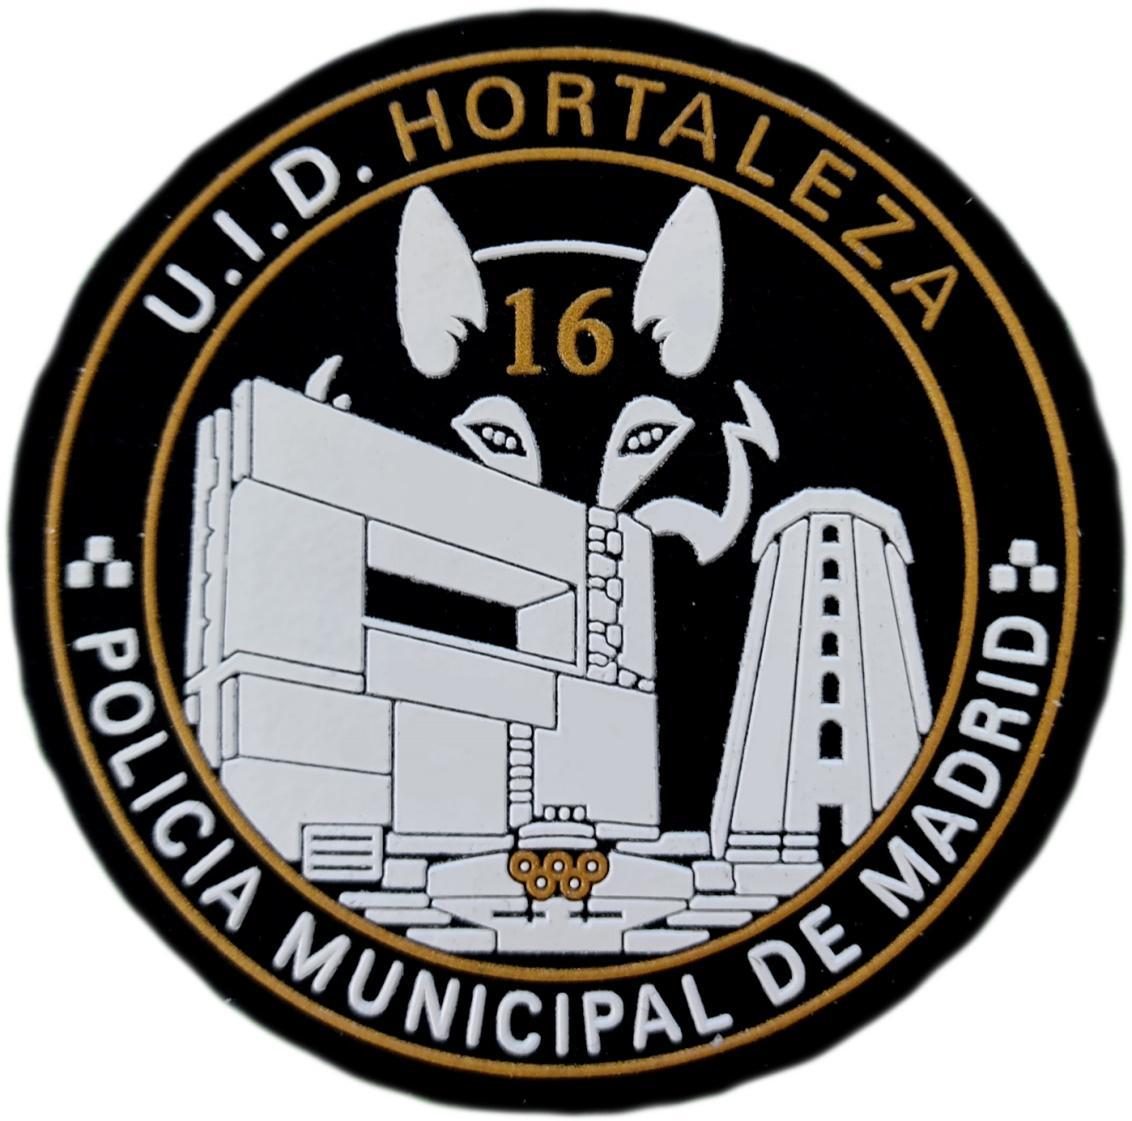 Policía Municipal Madrid UID Hortaleza parche insignia emblema distintivo